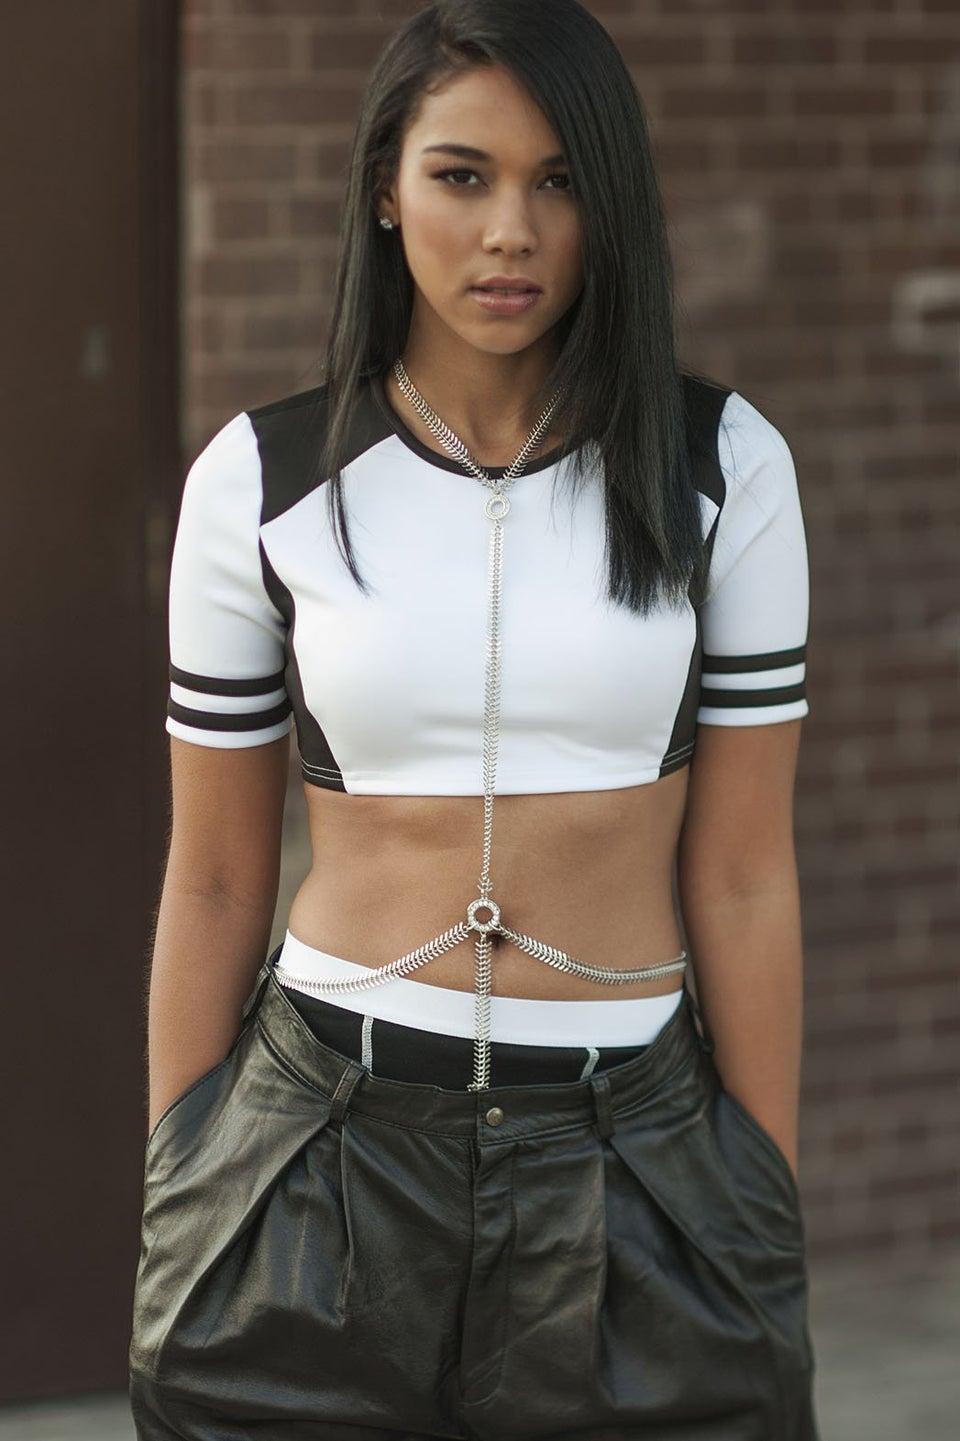 Aaliyah Biopic Earns 3.2 Million Viewers, Wendy Williams Speaks Out